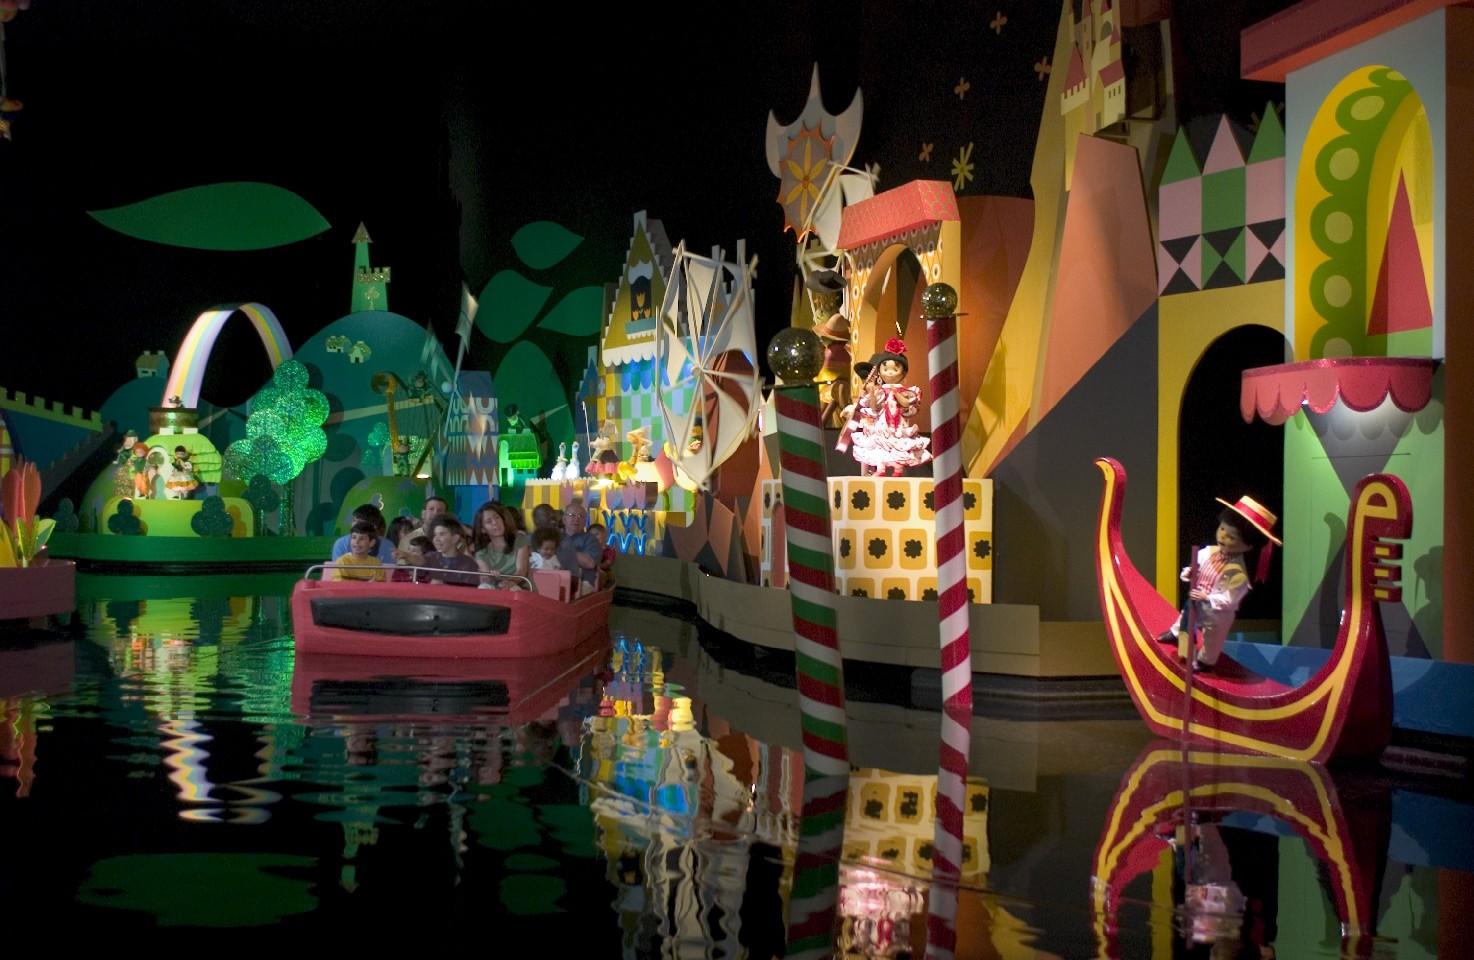 Disneyworld ride 'It's a Small World'